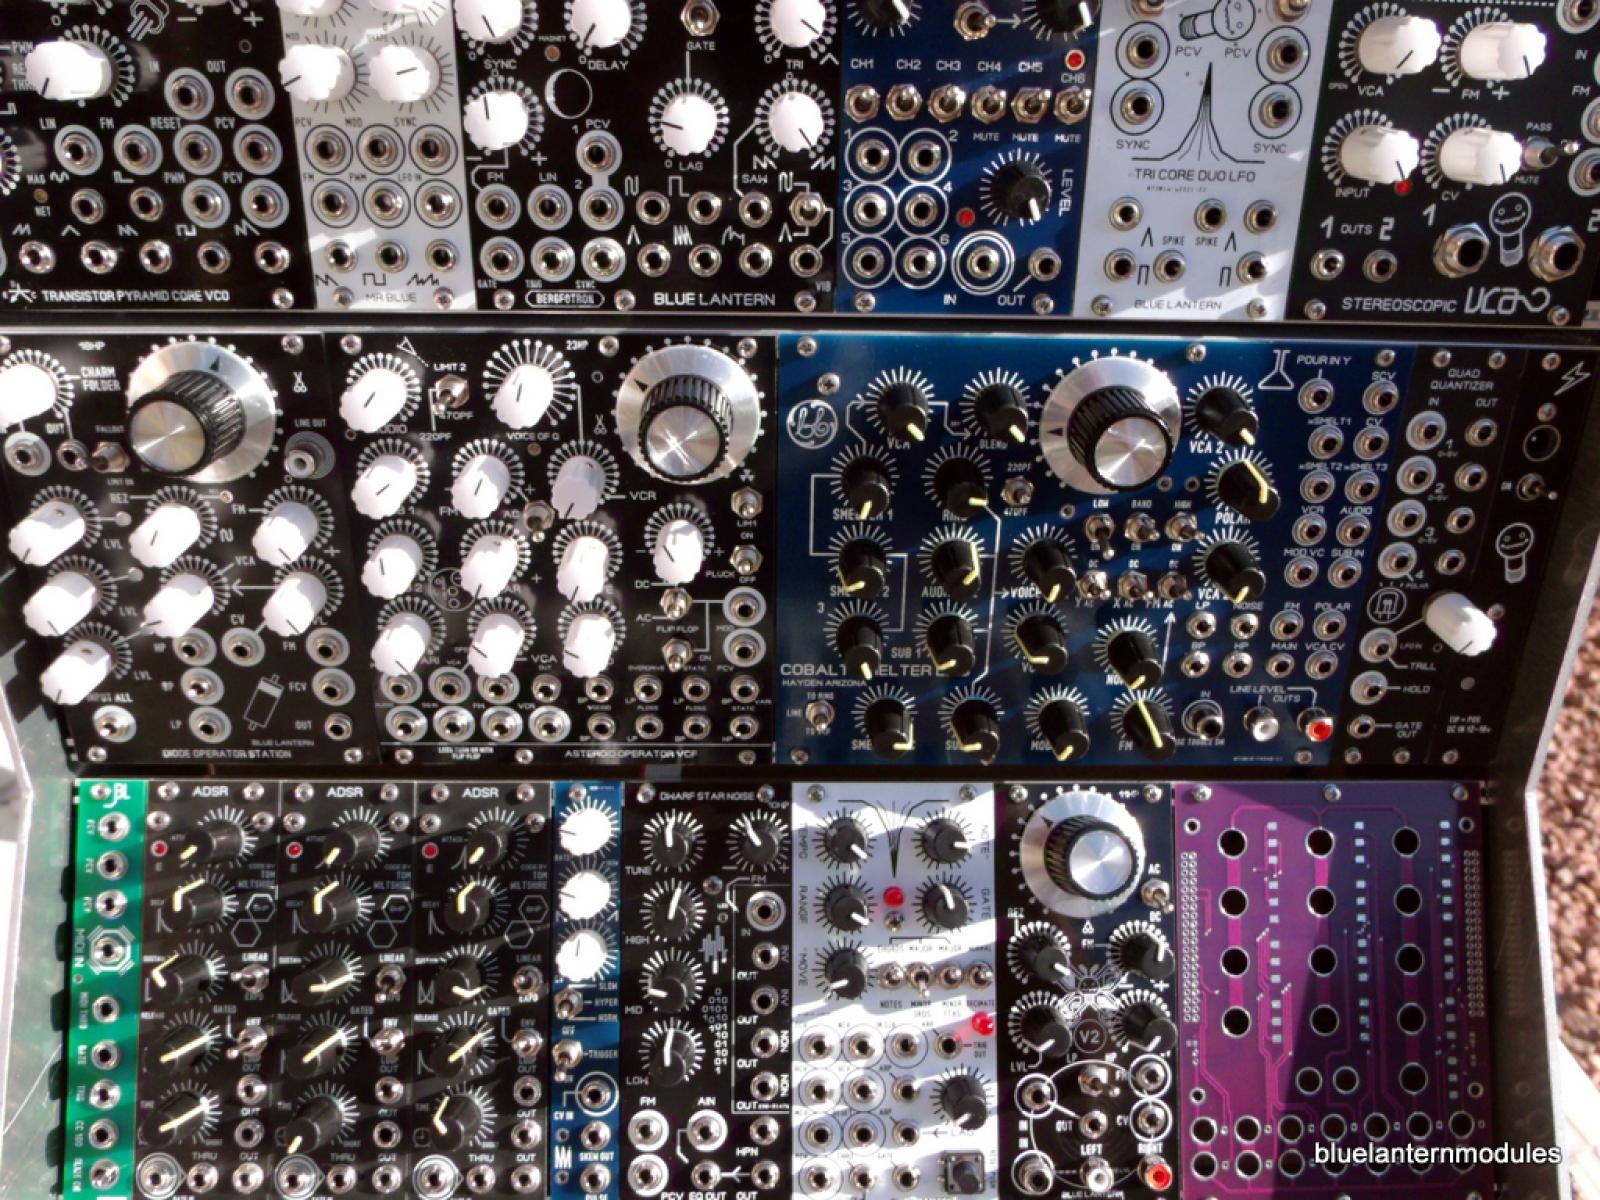 matrixsynth blue lantern modules 9u analog modular synthesizer system. Black Bedroom Furniture Sets. Home Design Ideas